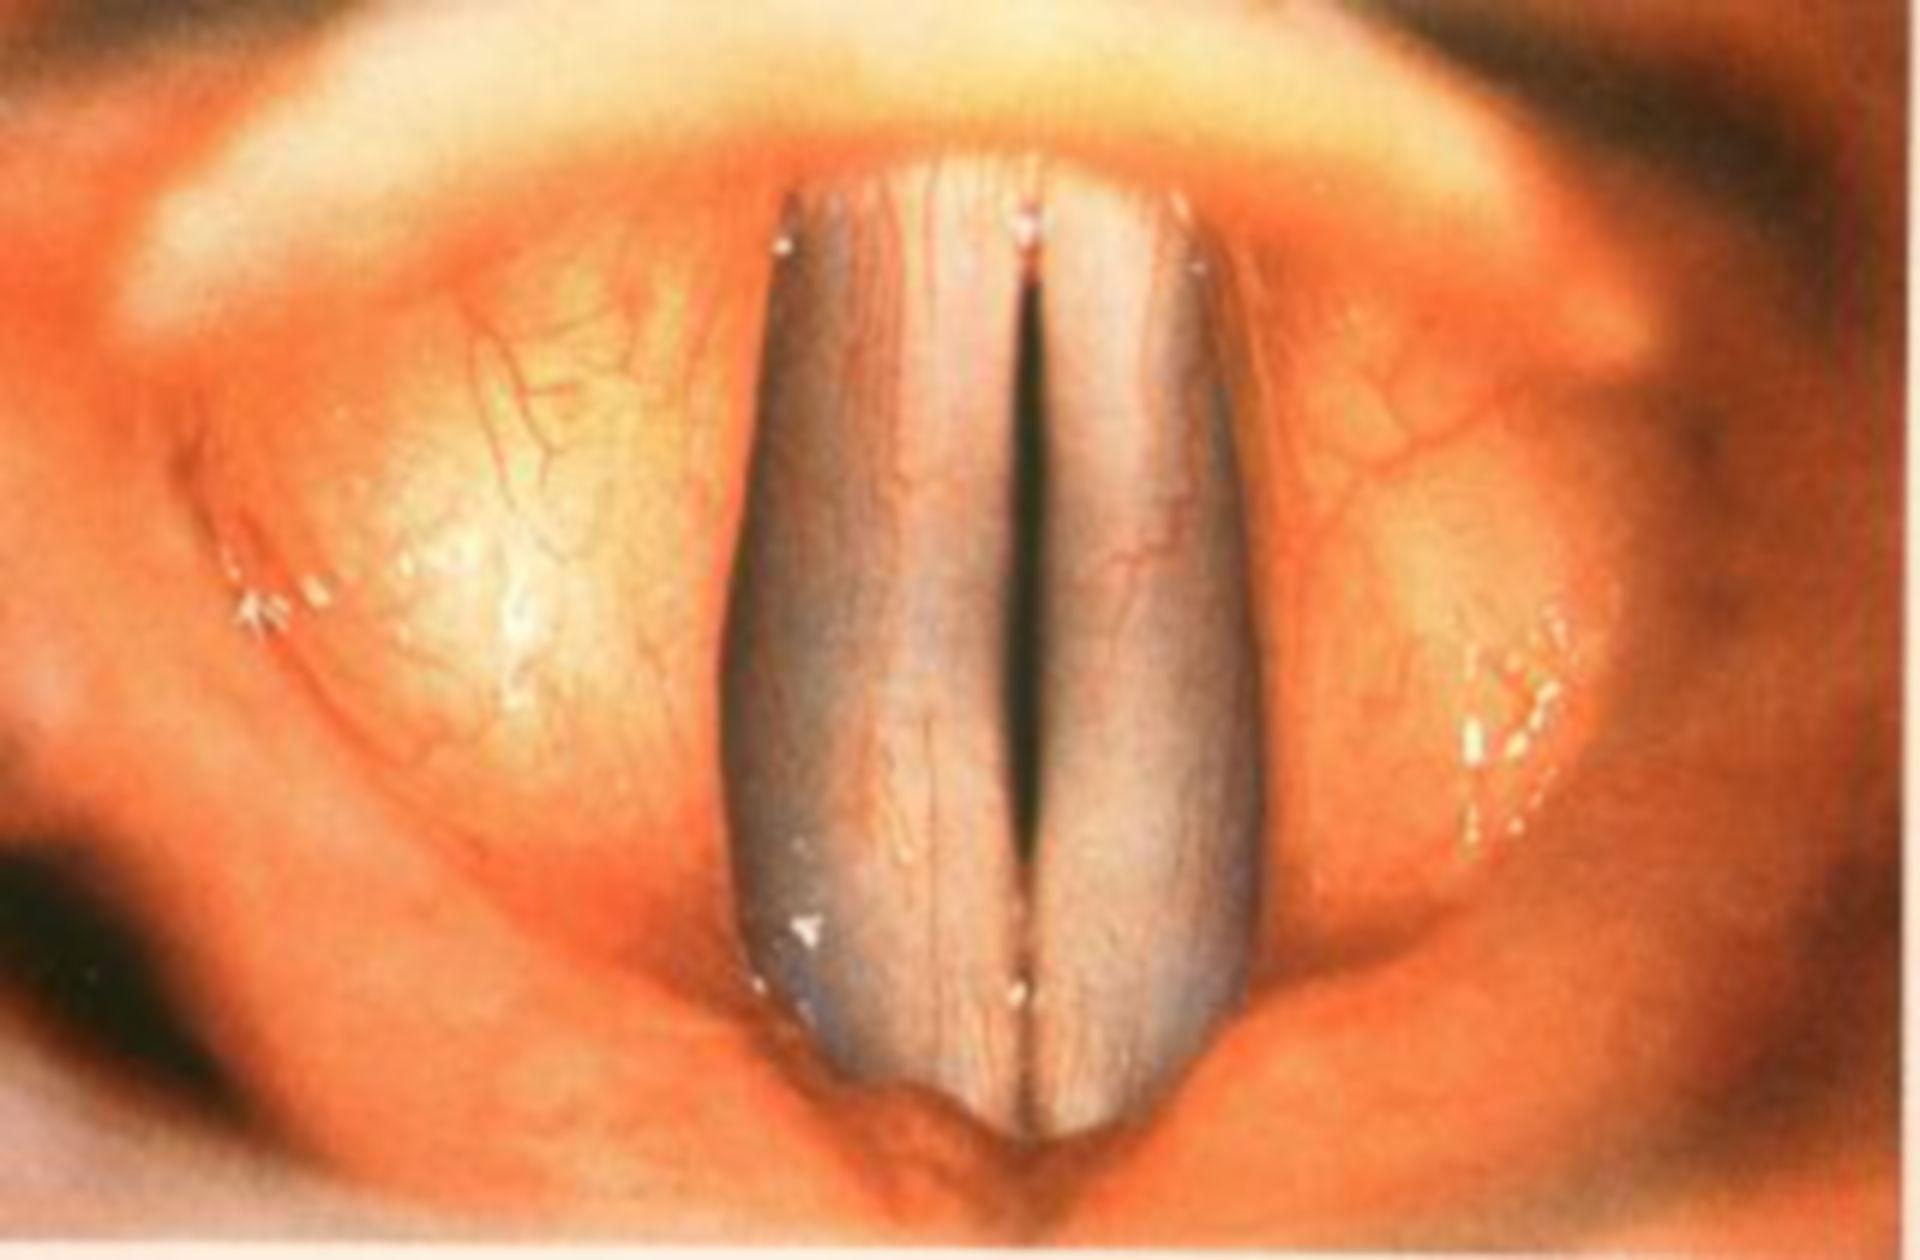 Normali reperti laringei